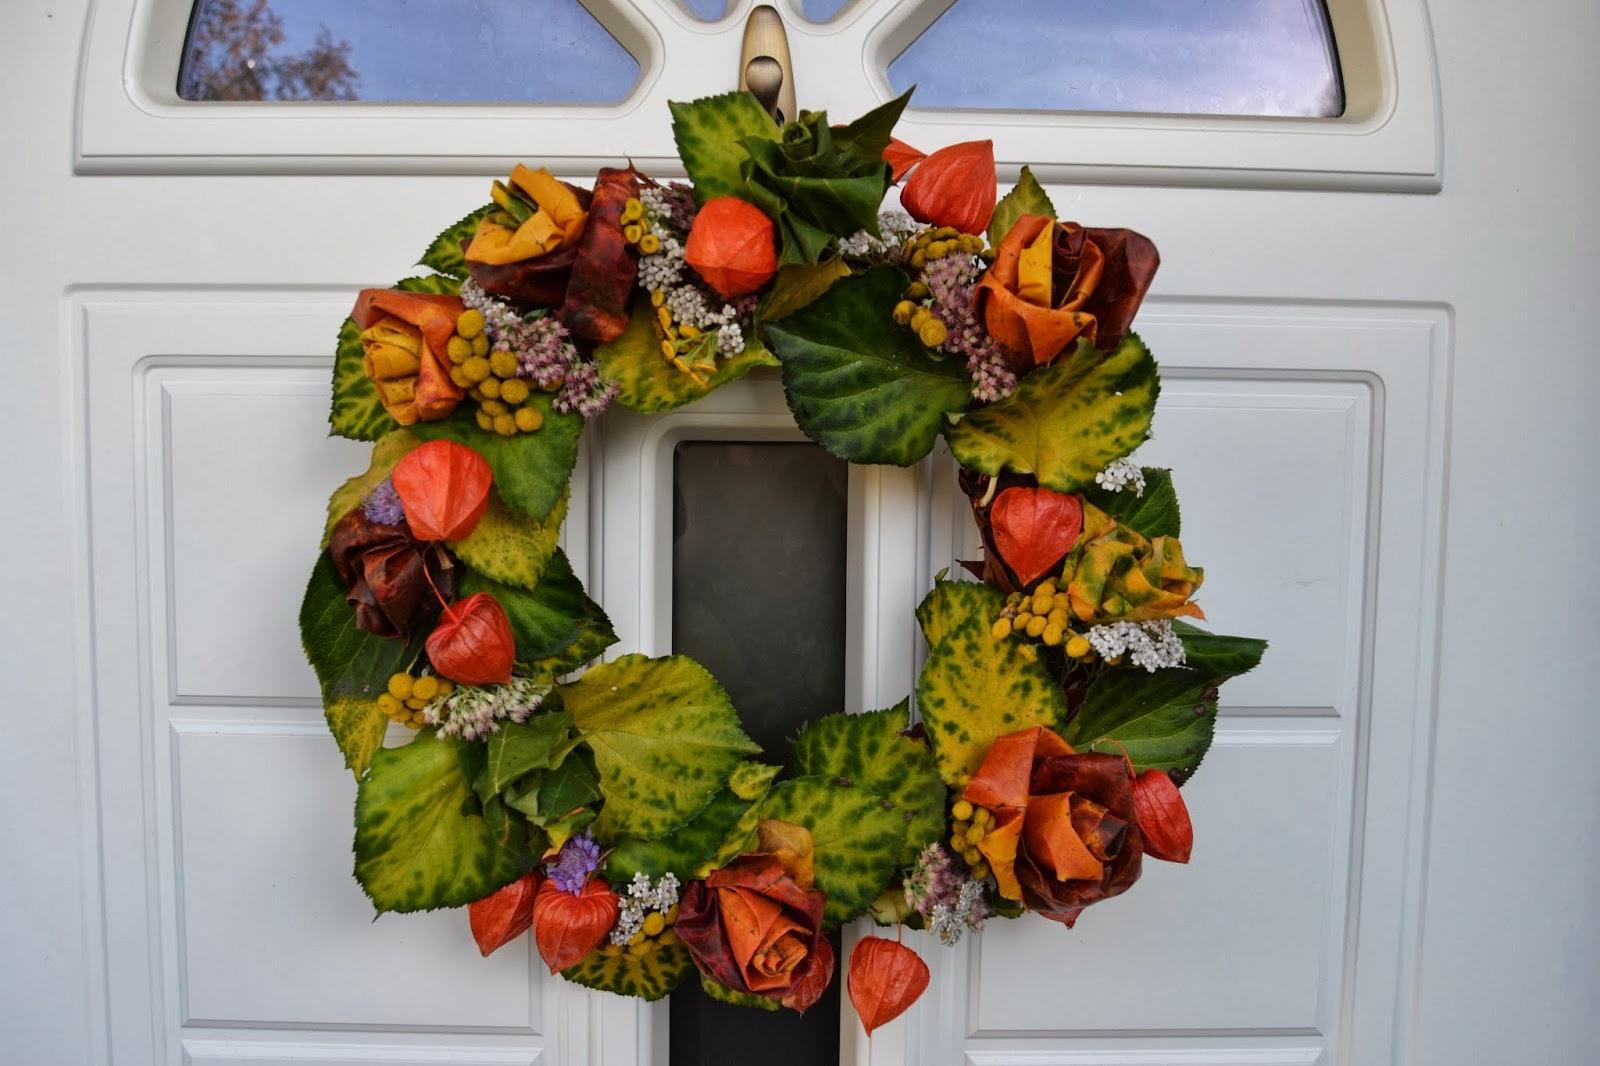 Syyskranssi – Autumnal wreath